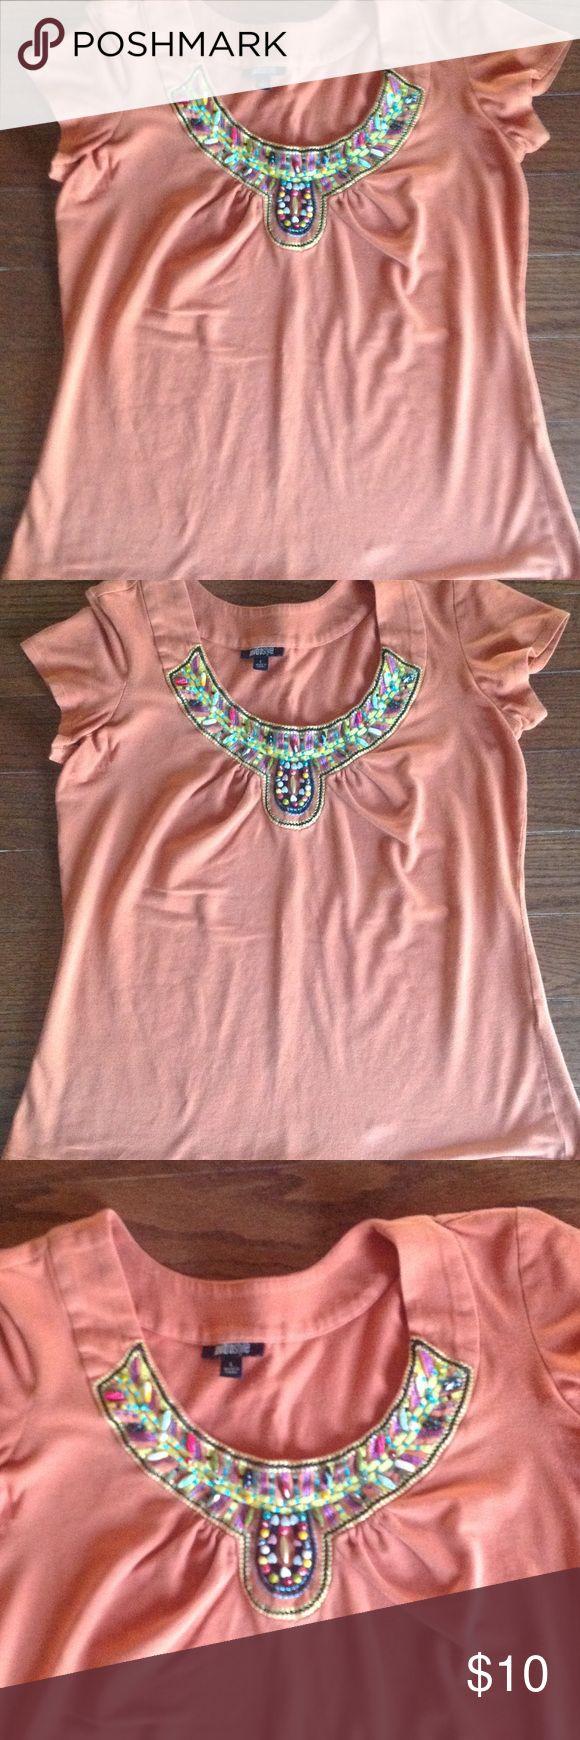 Aztec Print beaded short sleeve tshirt Round neckline, beading on neckline, color is harvest orange metrostyle Tops Tees - Short Sleeve